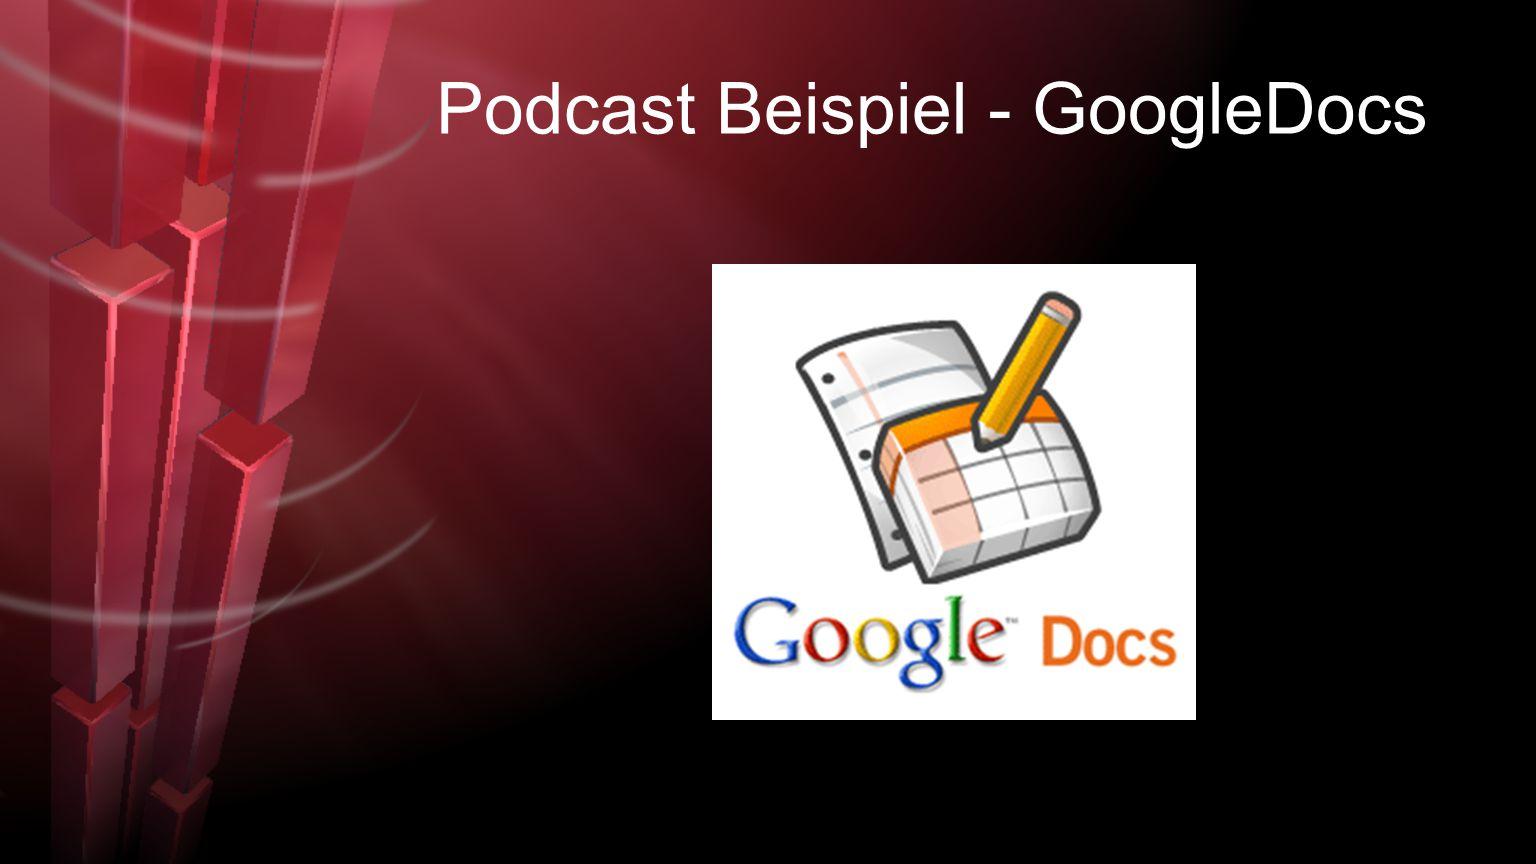 Podcast Beispiel - GoogleDocs